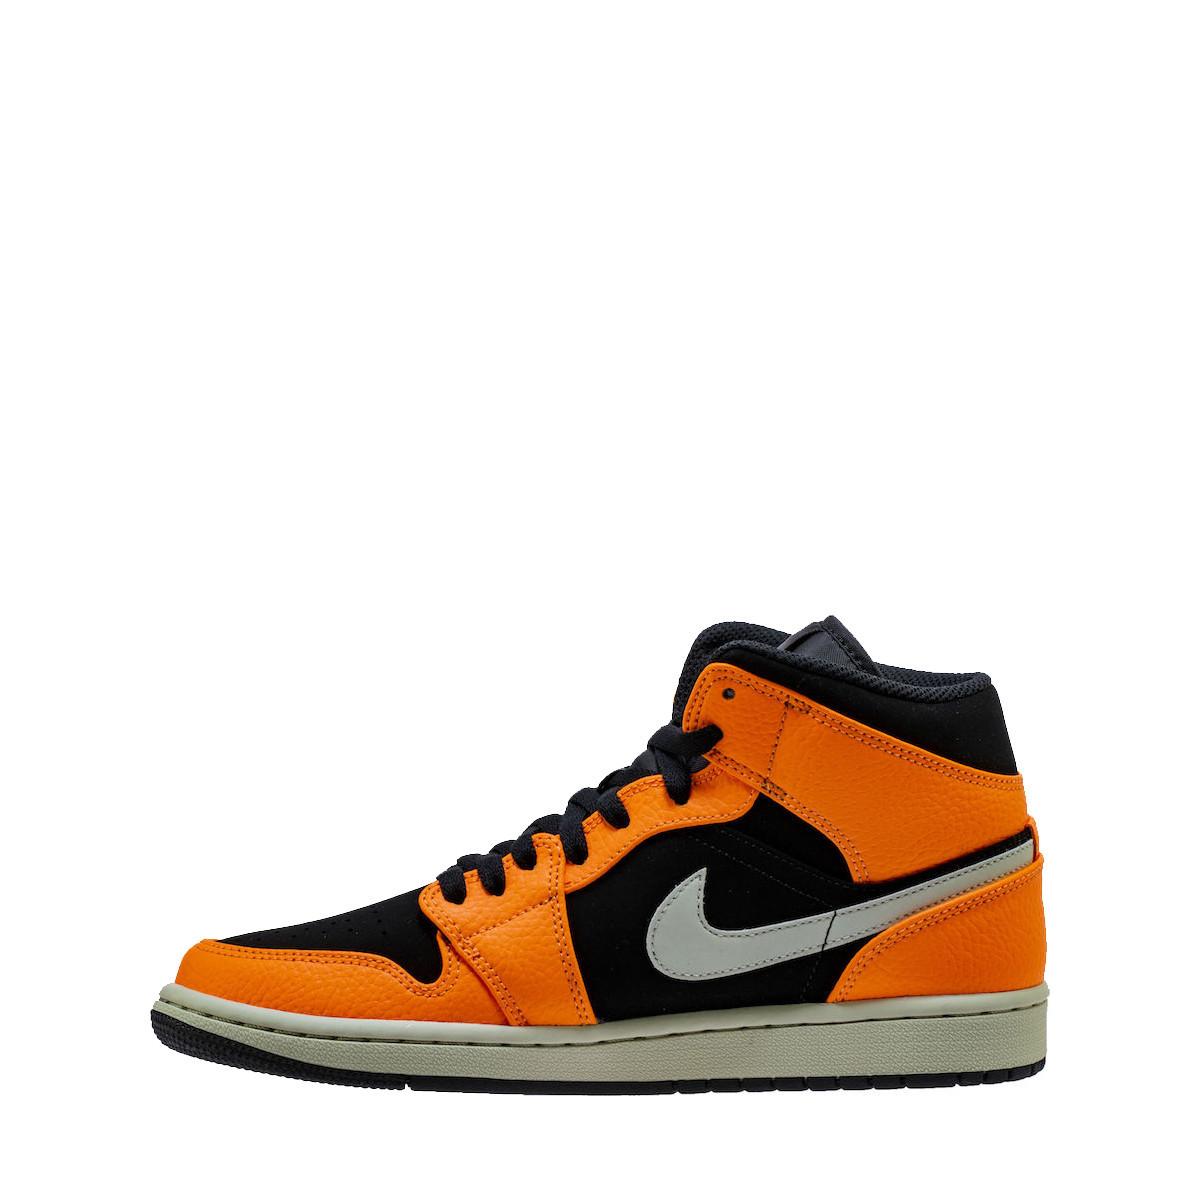 timeless design cb796 4ca54 Nike Basket Nike AIR Jordan 1 Mid - 554724-062. Loading zoom